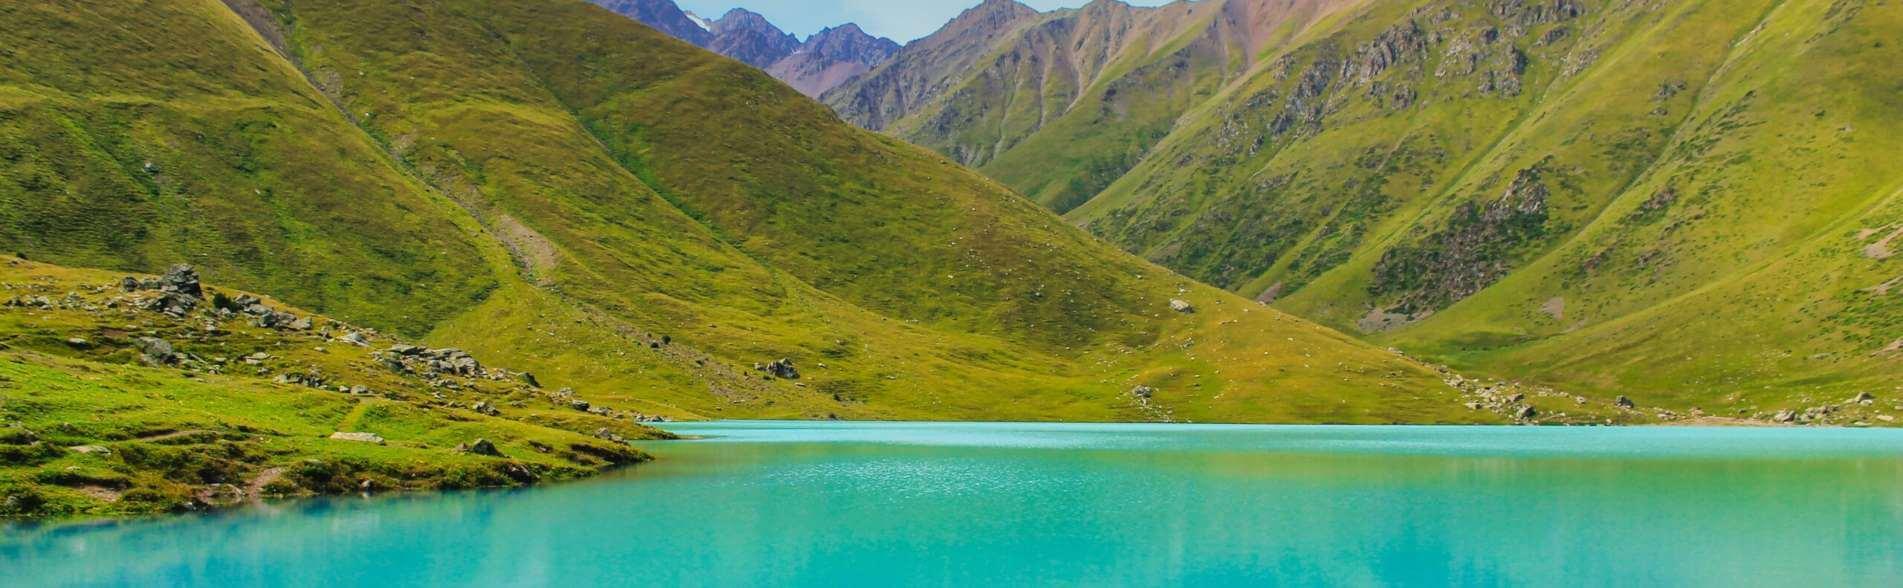 Hiking tours Adras Travel